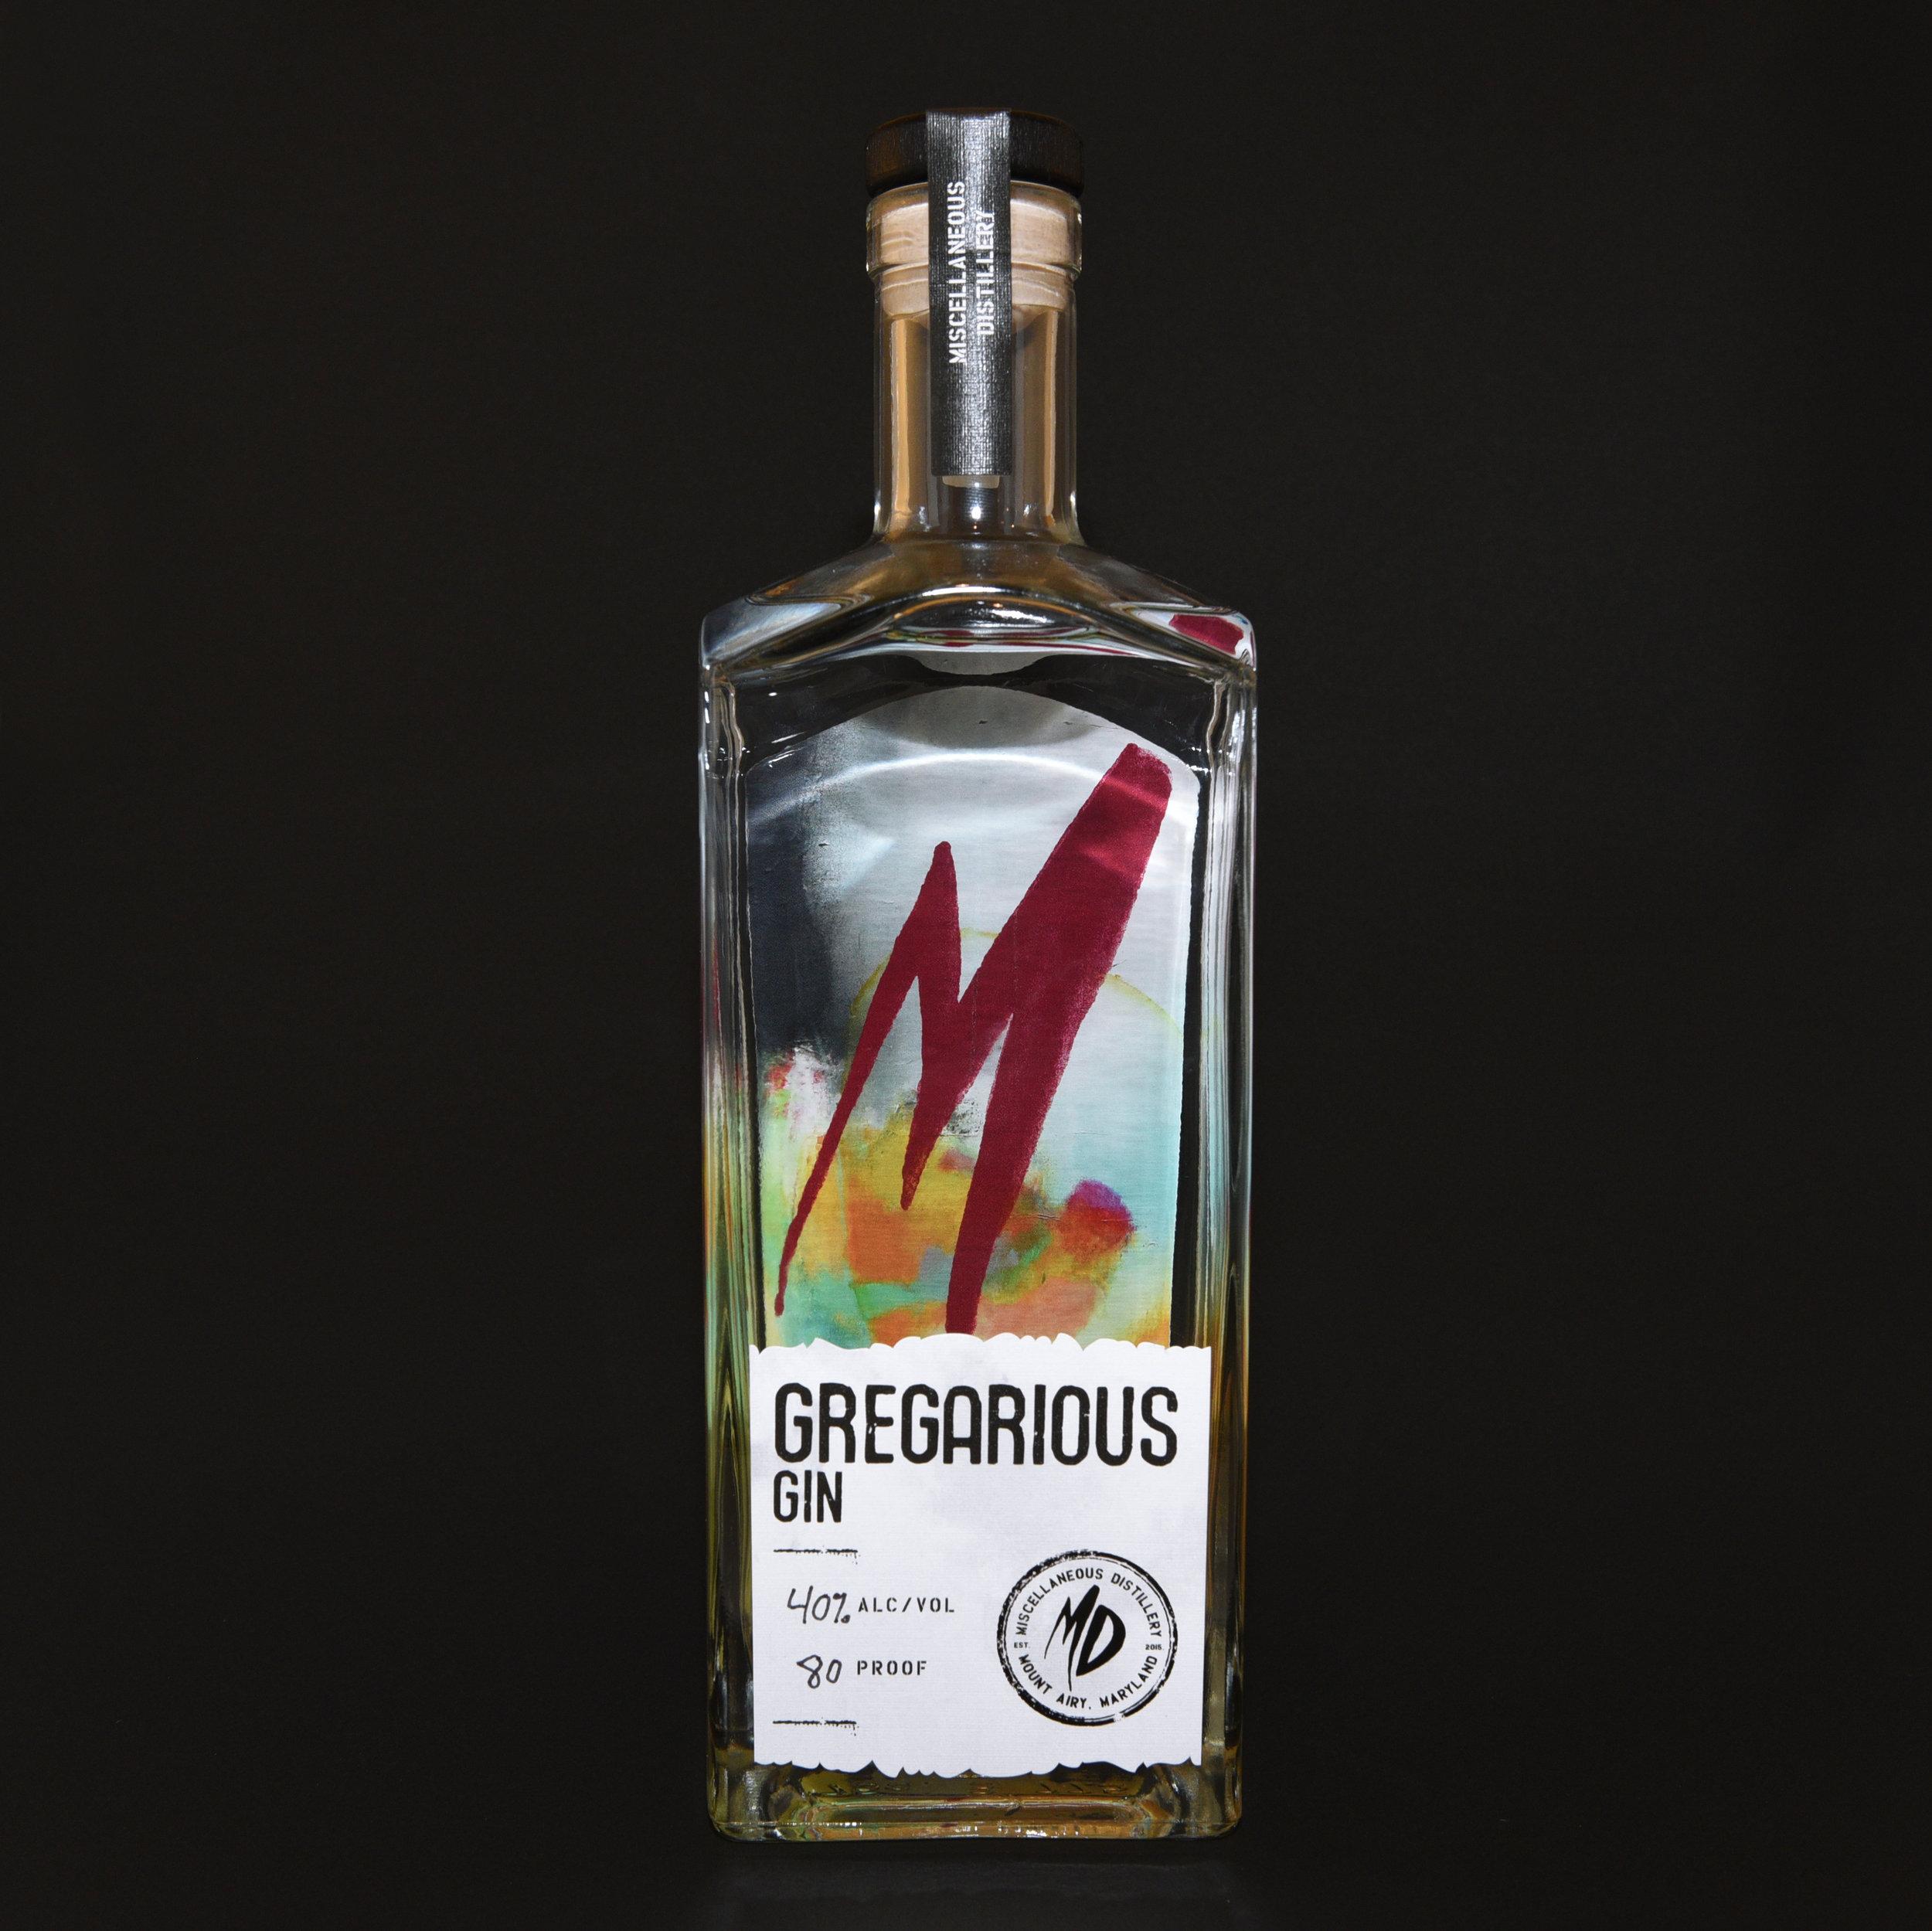 MISC_Gregarious Gin_black_bgkd.jpg